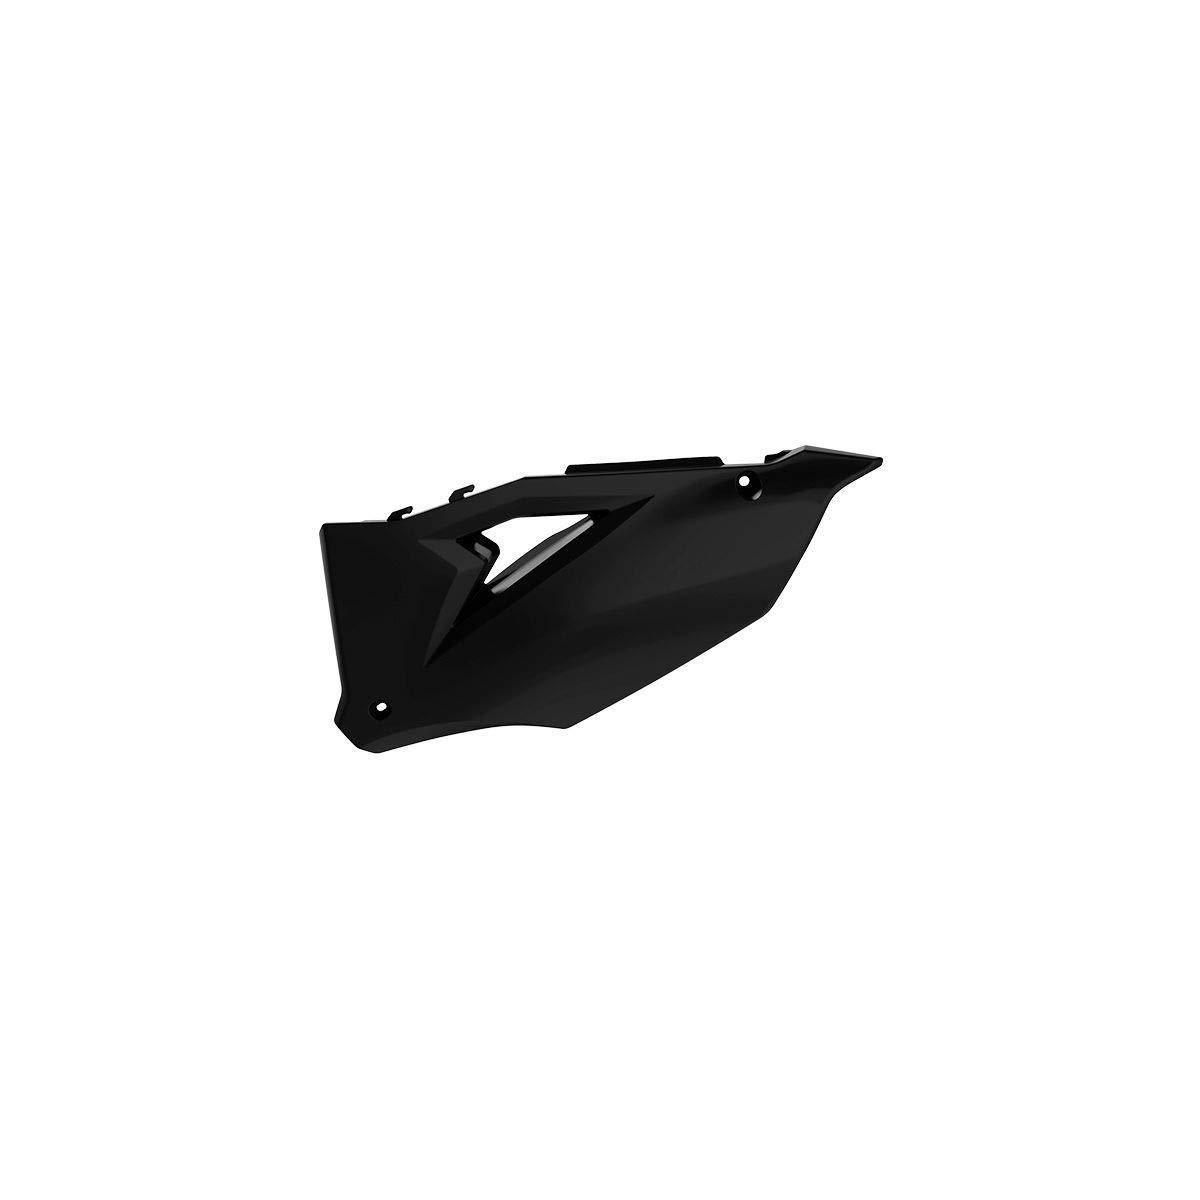 Black Polisport 19-20 Kawasaki KX450 Side Panel Set